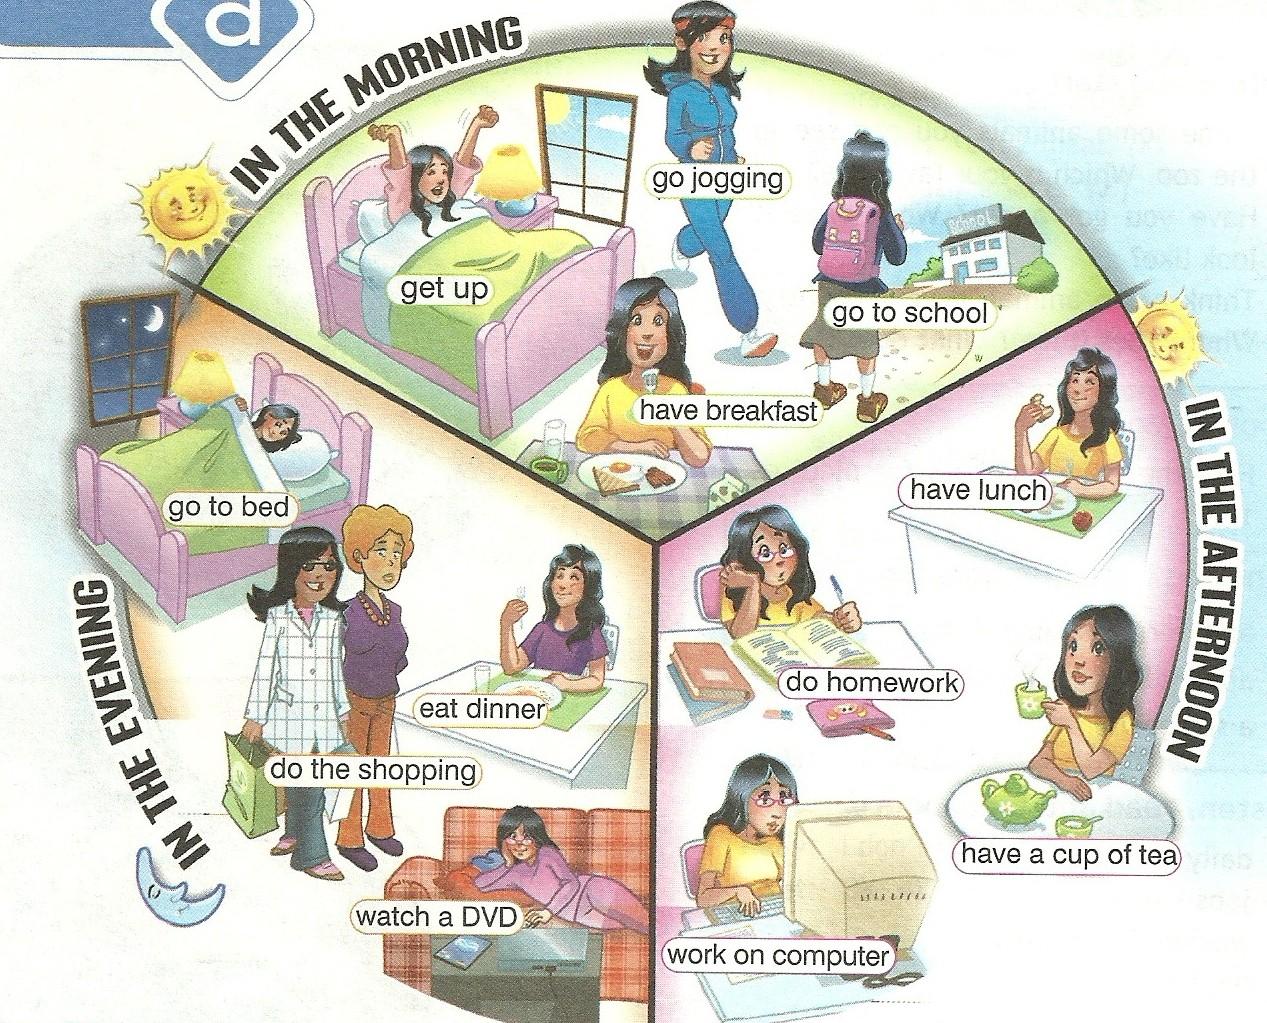 расписание дня на английском картинки преподаватели